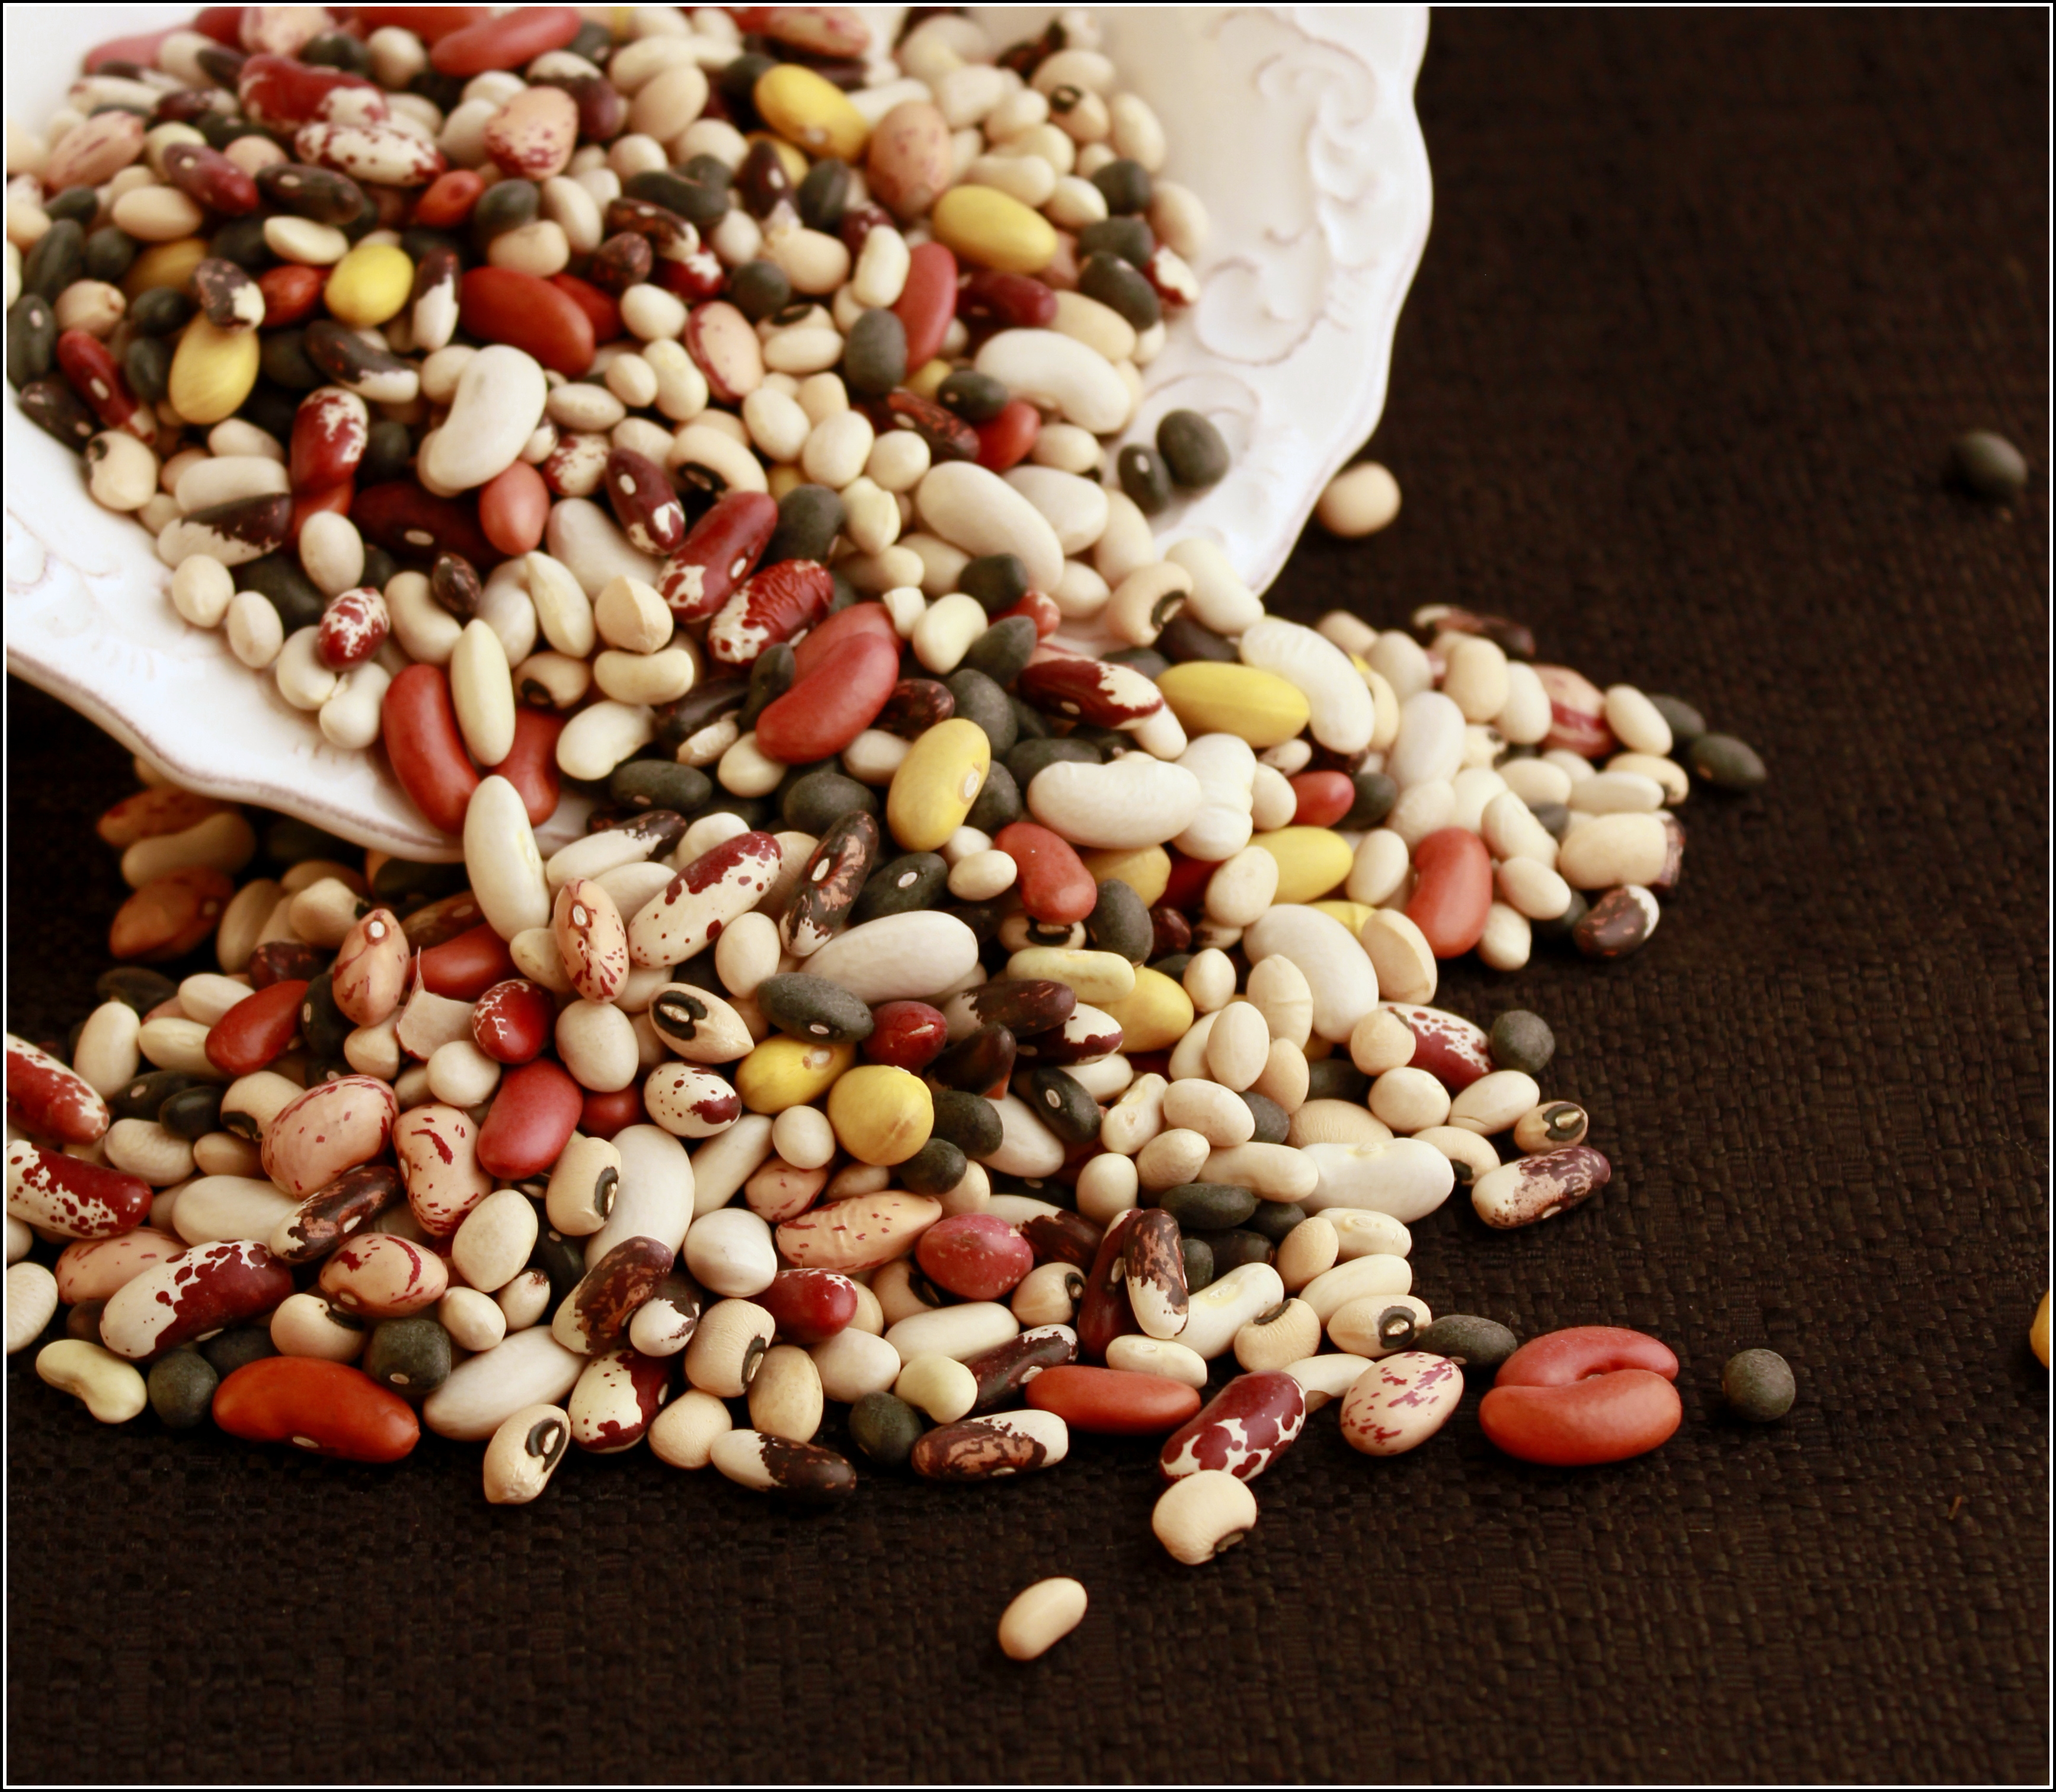 Beans Spilling by Dena T Bray©